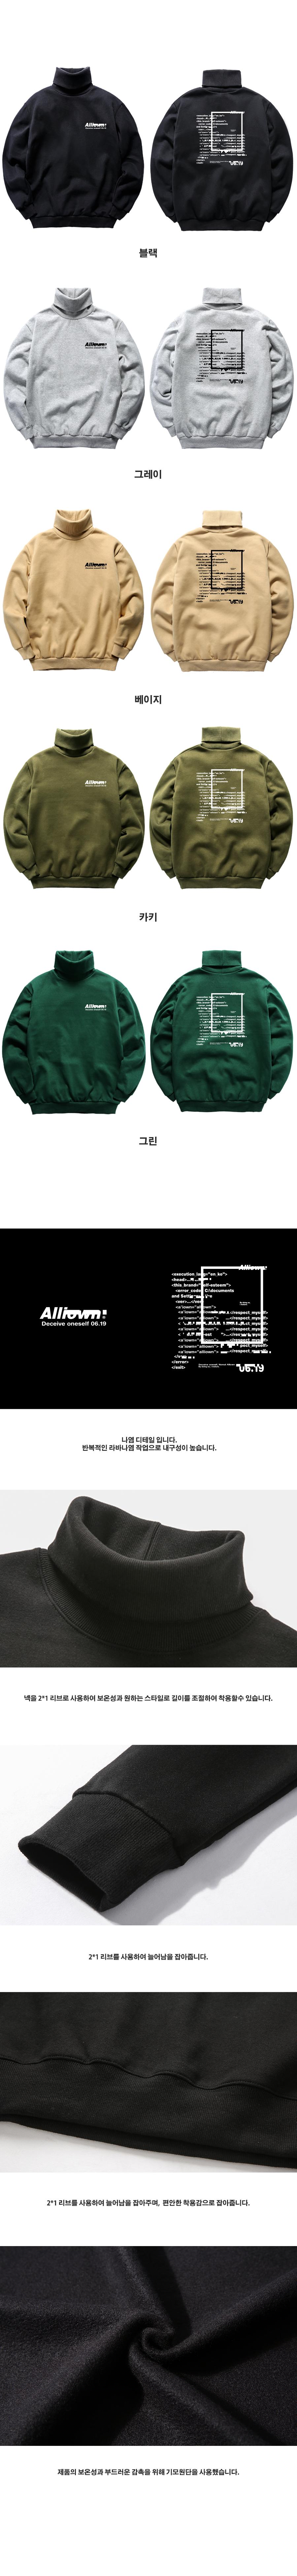 a8s_072.jpg